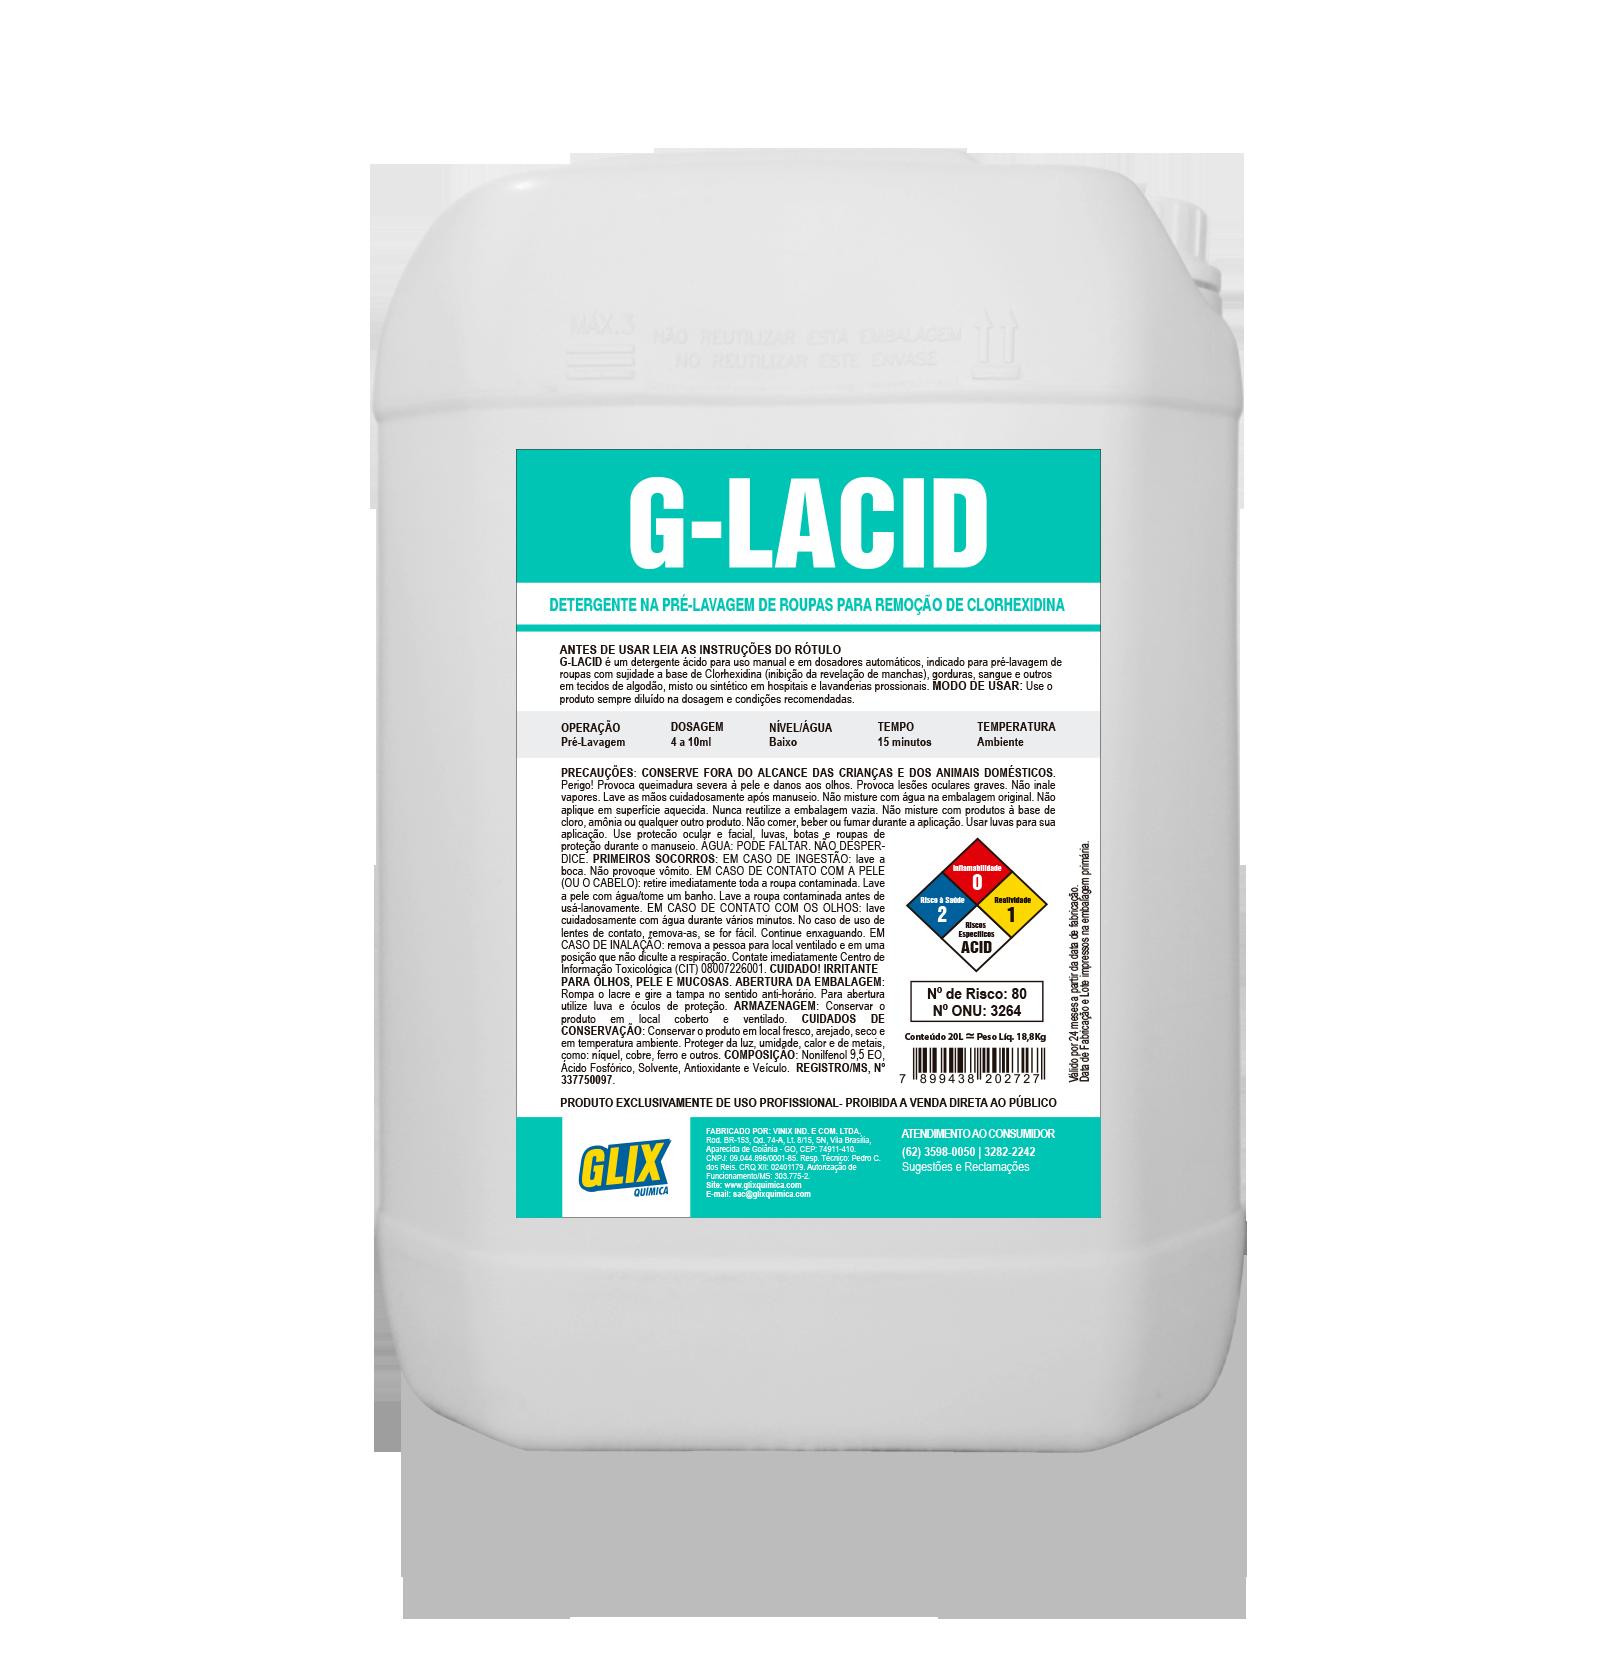 G-LACID